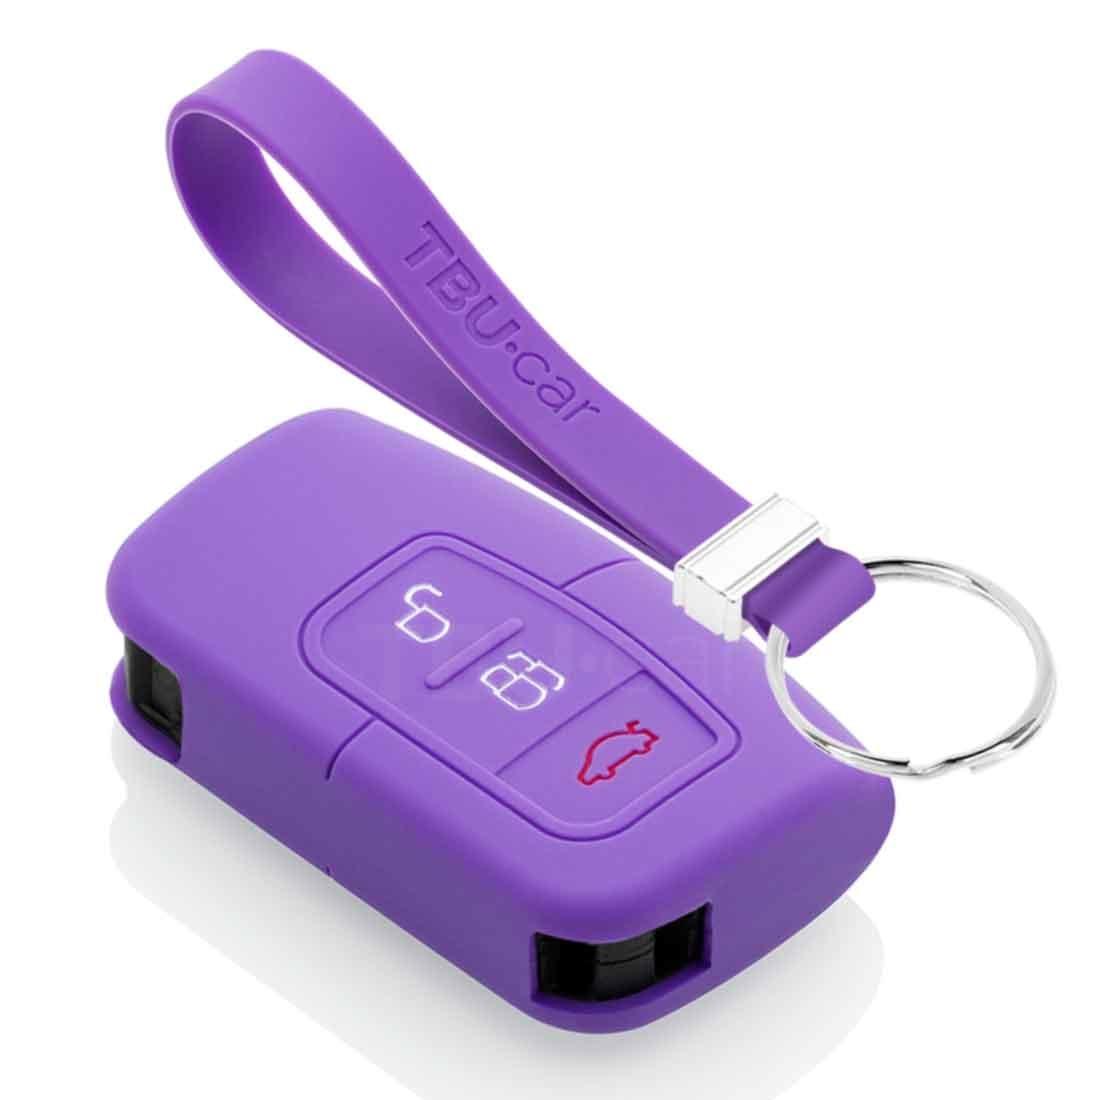 TBU car TBU car Autoschlüssel Hülle kompatibel mit Ford 3 Tasten (Keyless Entry) - Schutzhülle aus Silikon - Auto Schlüsselhülle Cover in Violett